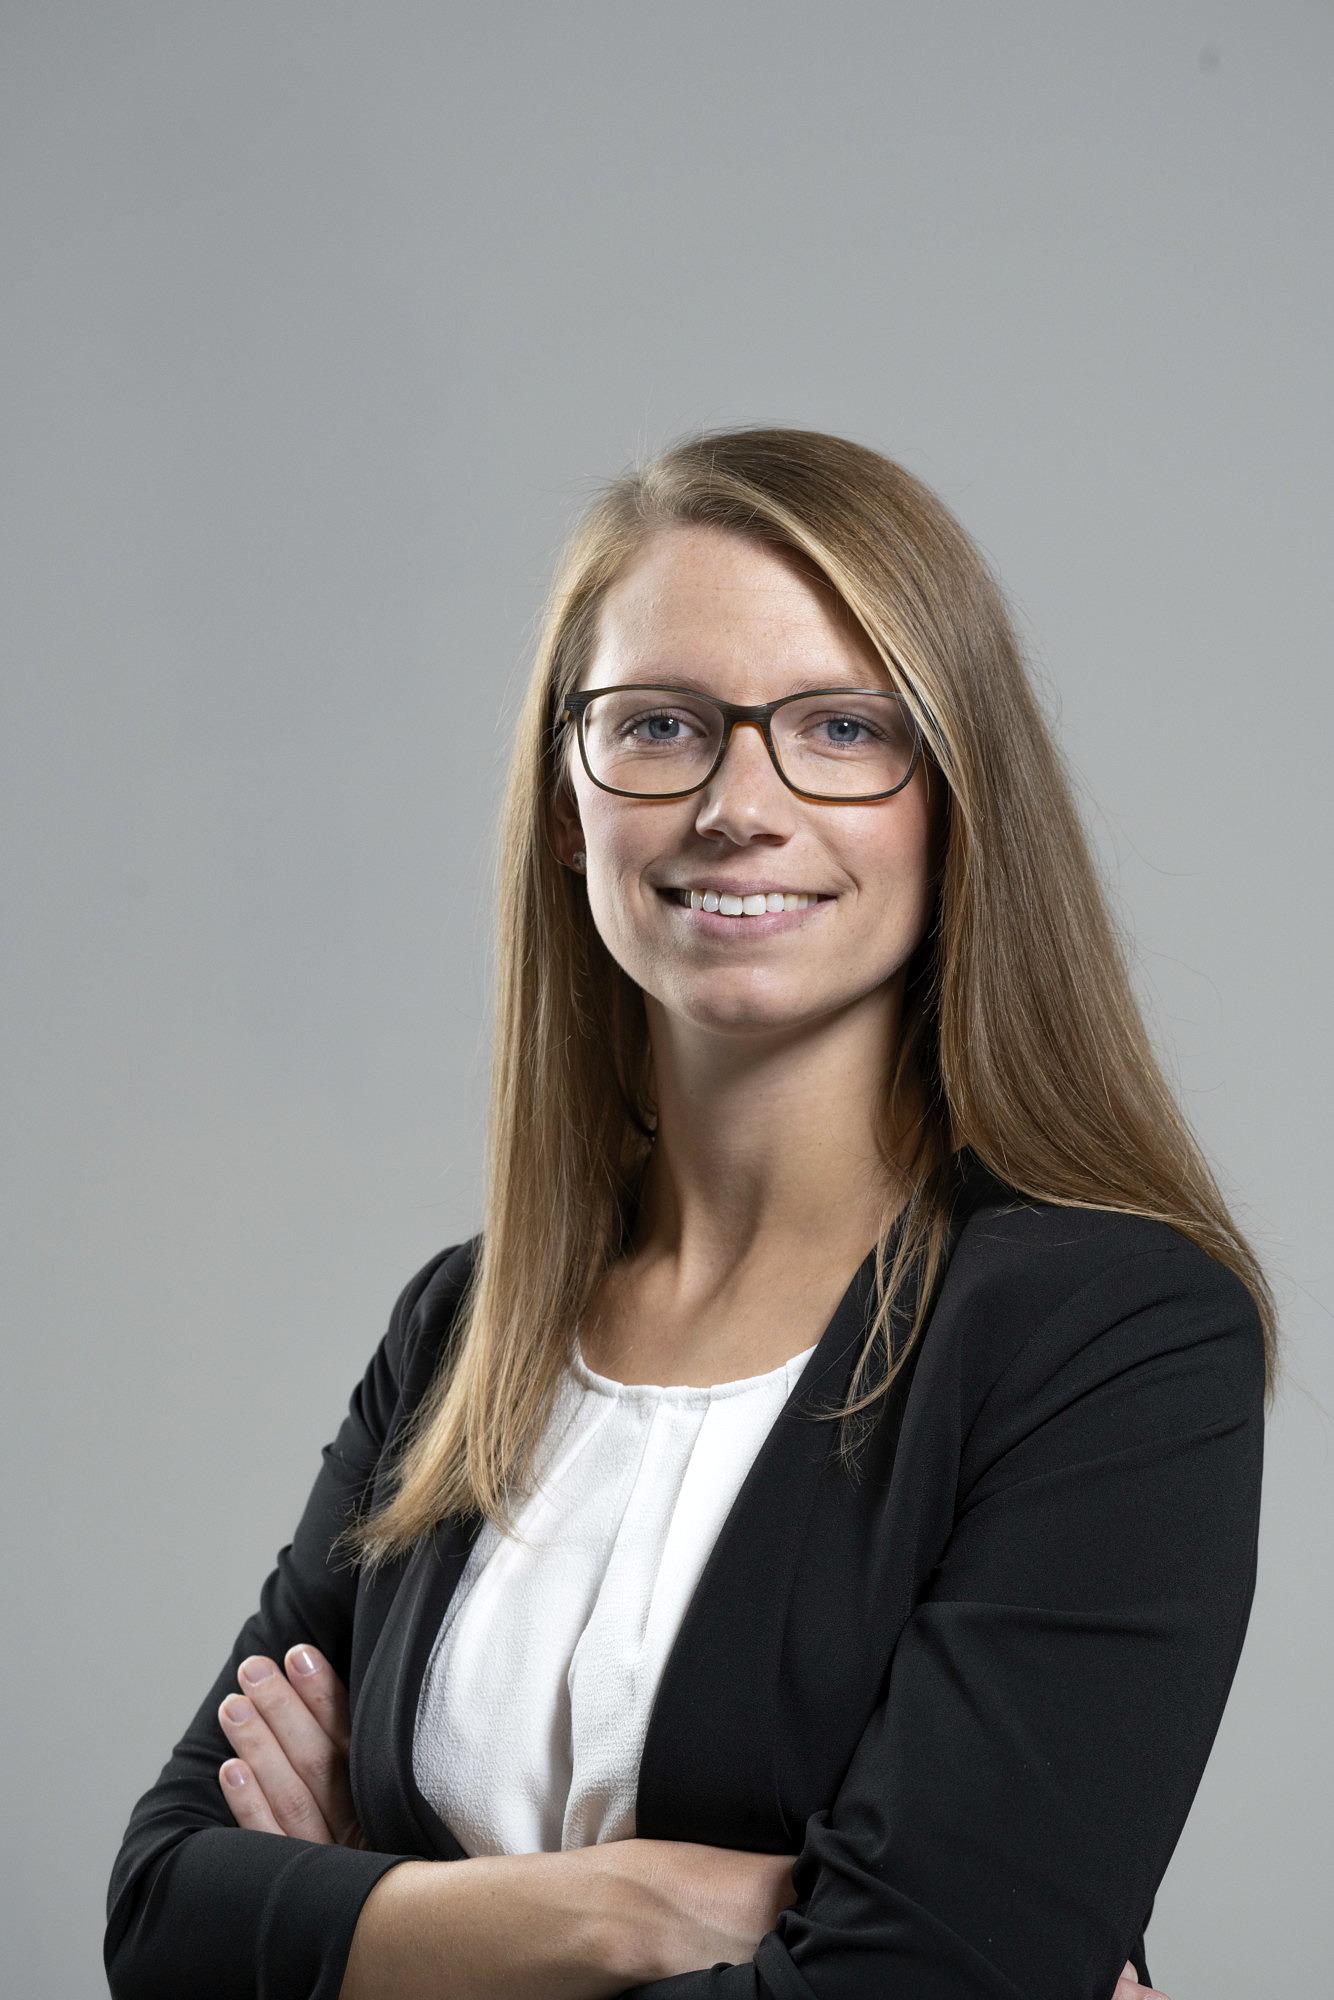 Dr. Anja Weißenfels